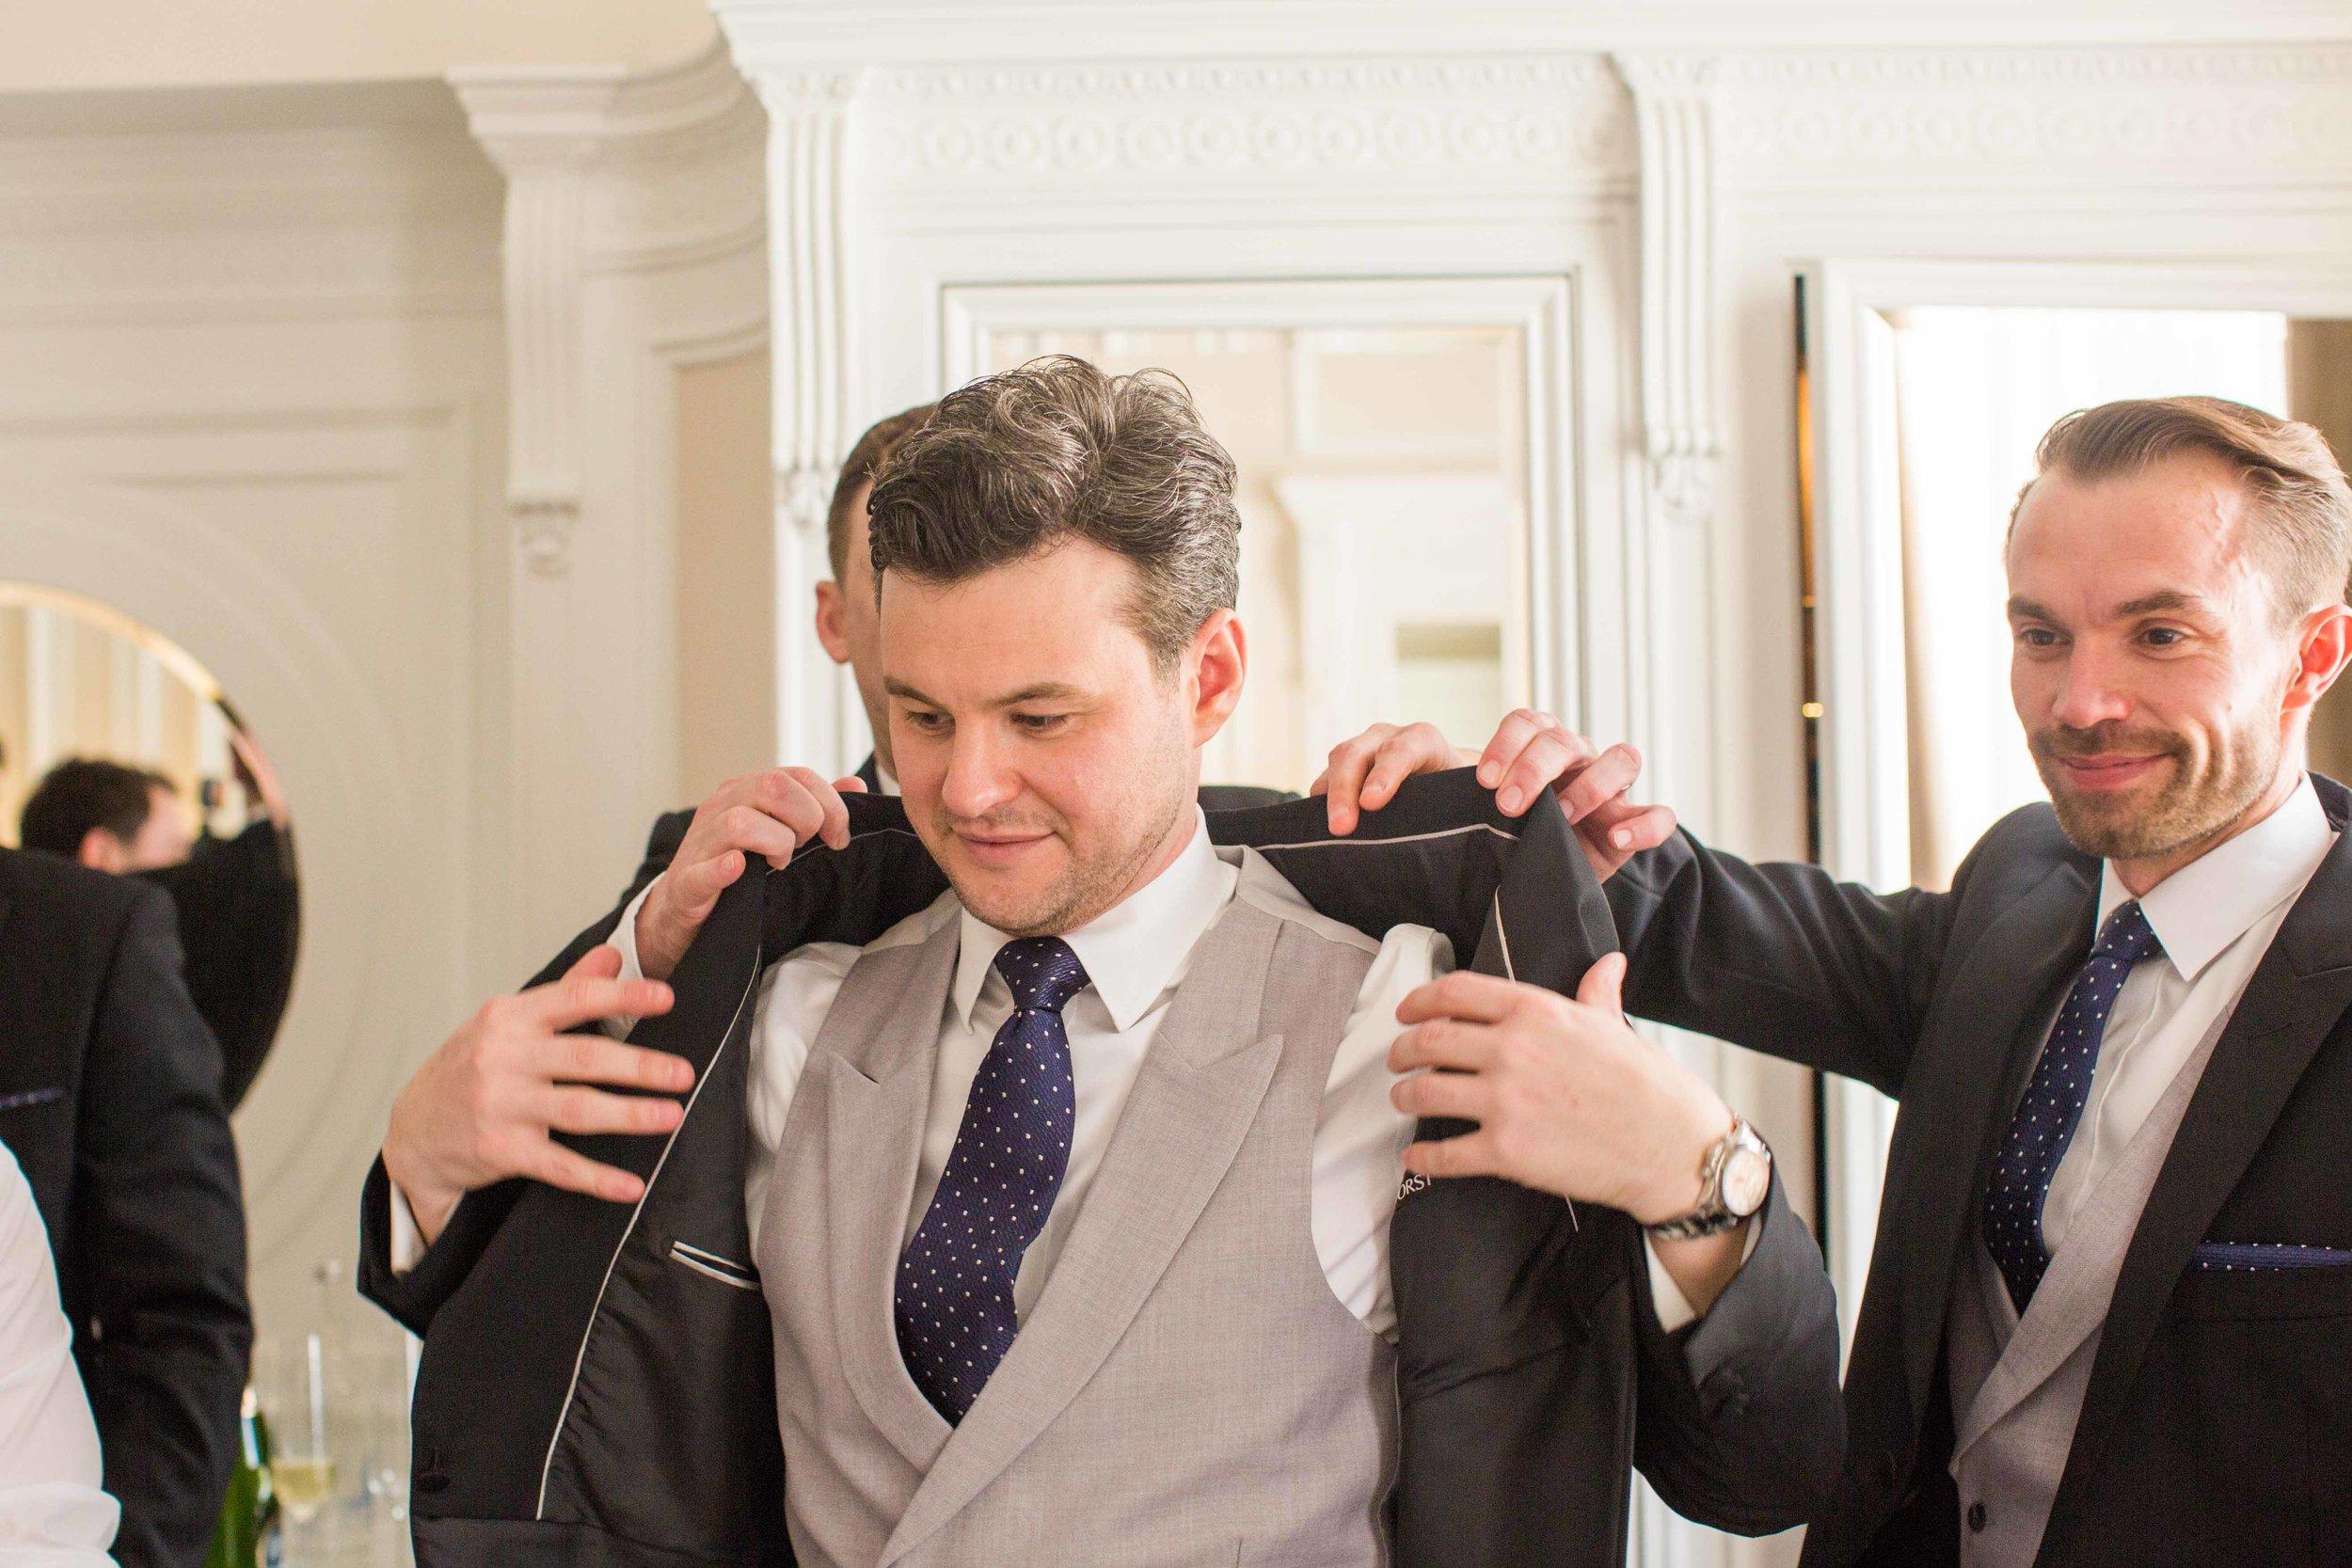 claridges-hotel-wedding-photographer-london-mayfair-natalia-smith-photography-31.jpg